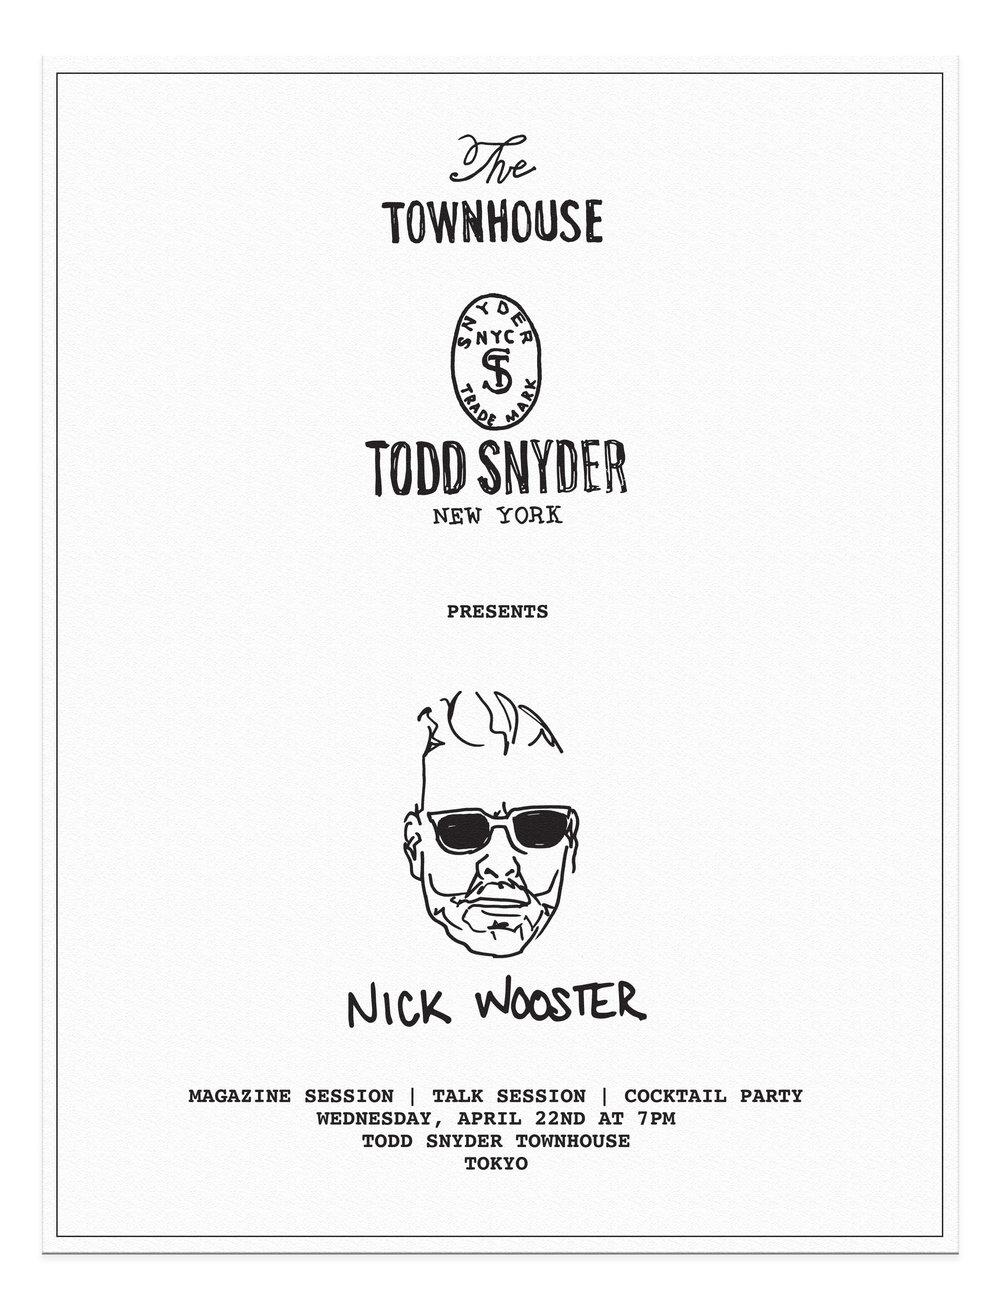 Todd Snyder x Nick Wooster